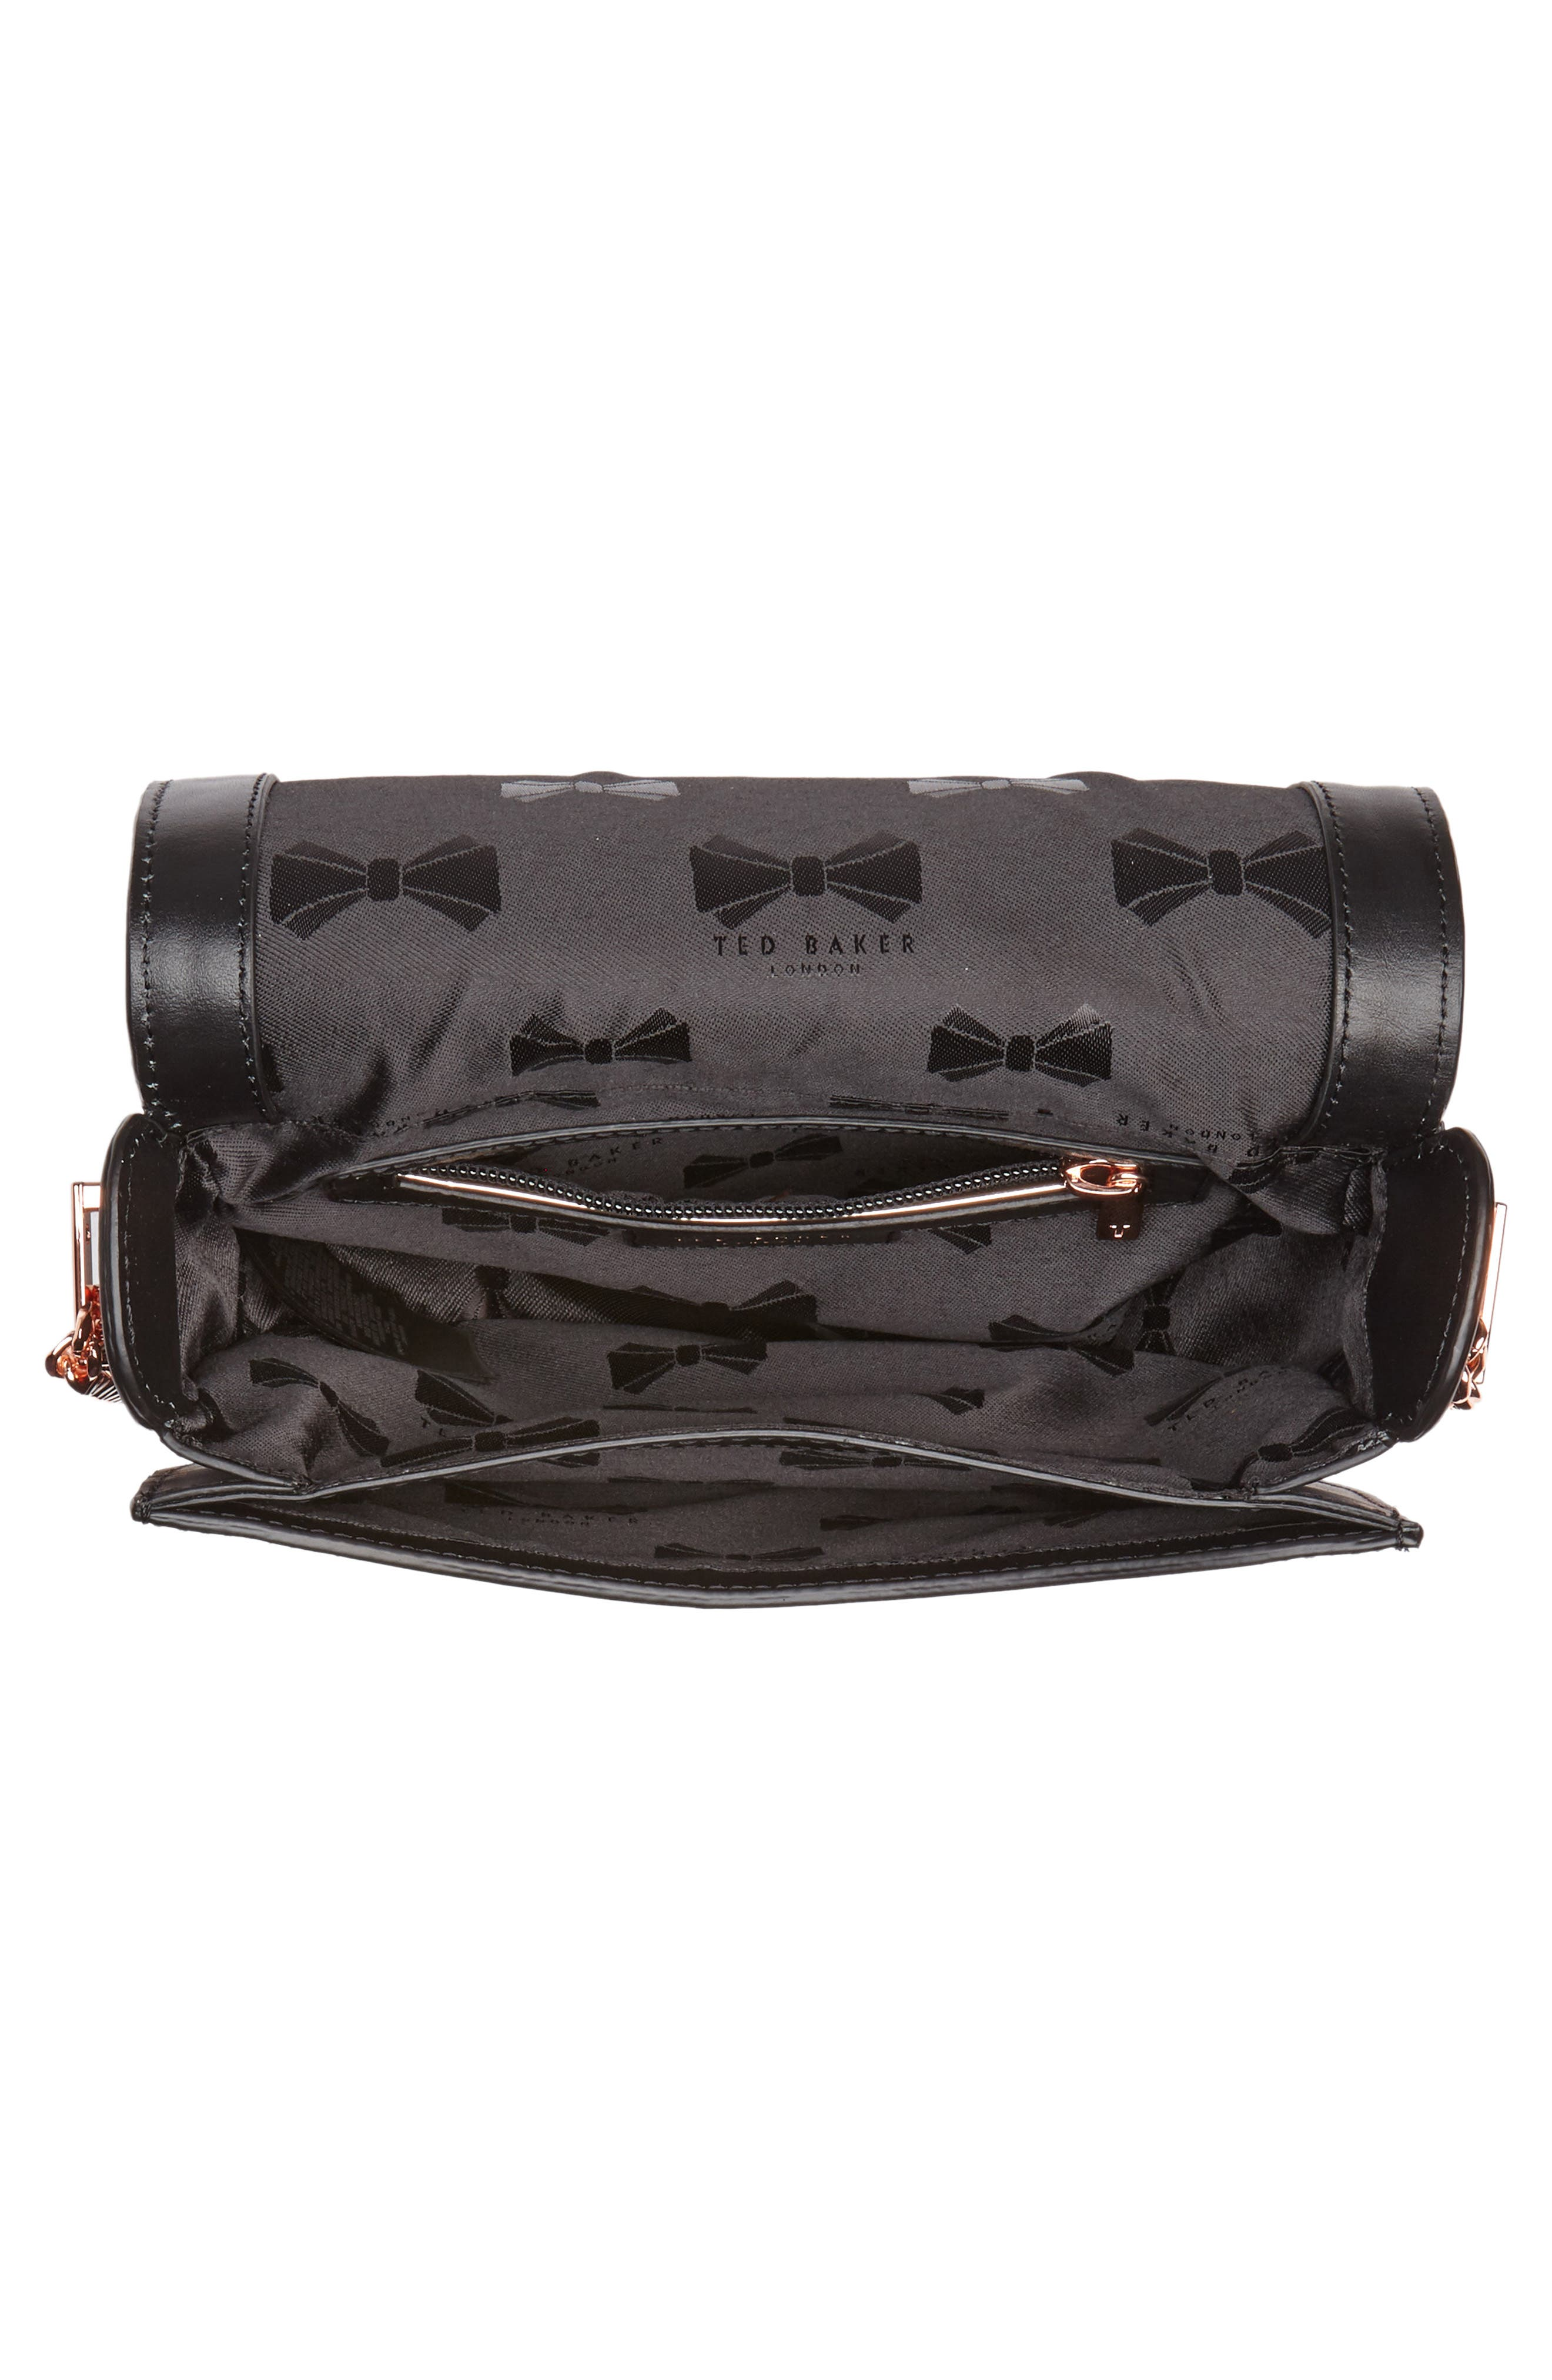 Roslyn Leather Crossbody Bag,                             Alternate thumbnail 4, color,                             Black